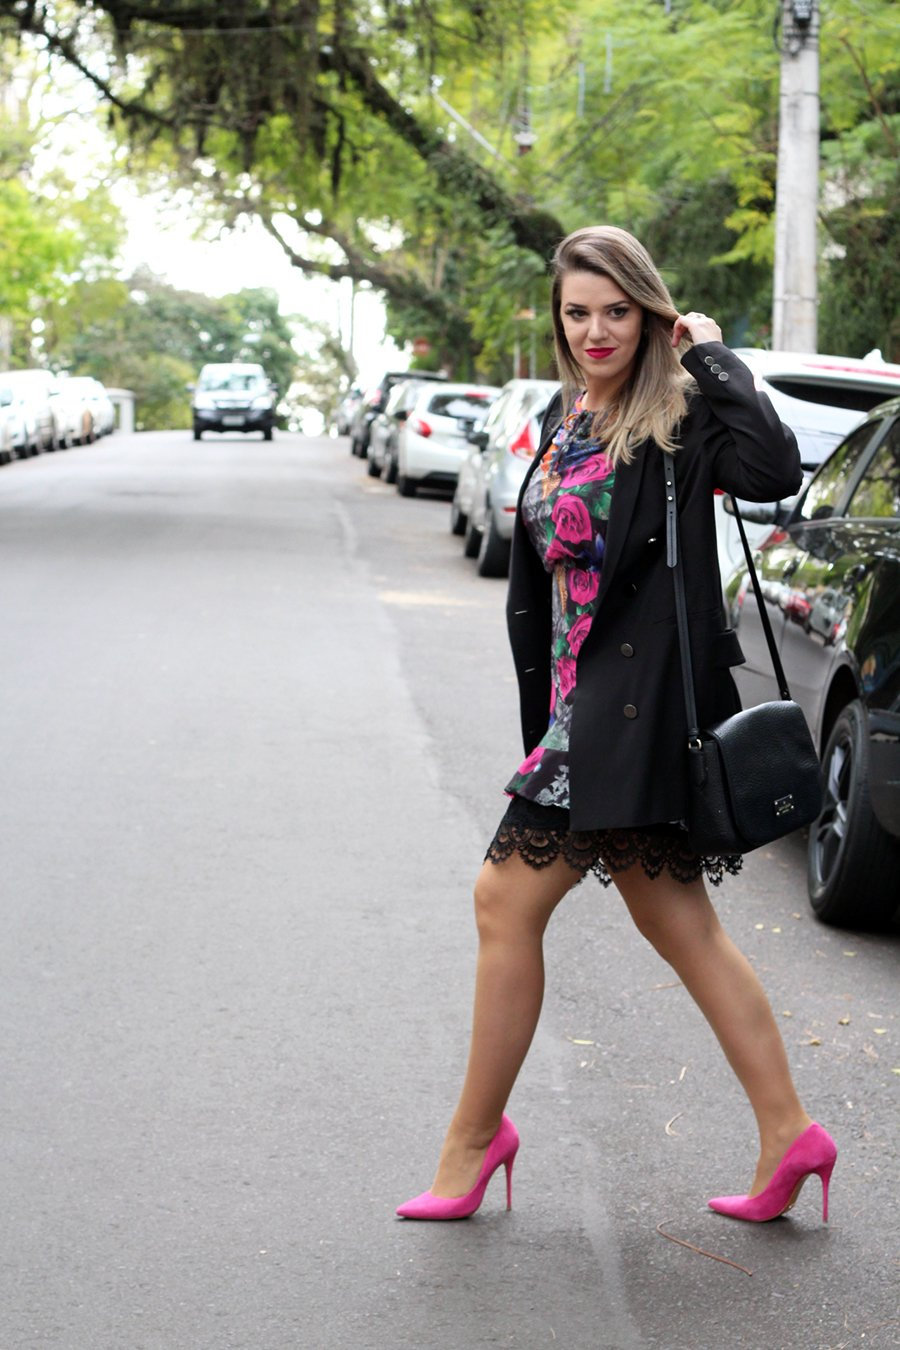 ivana vestido com anagua